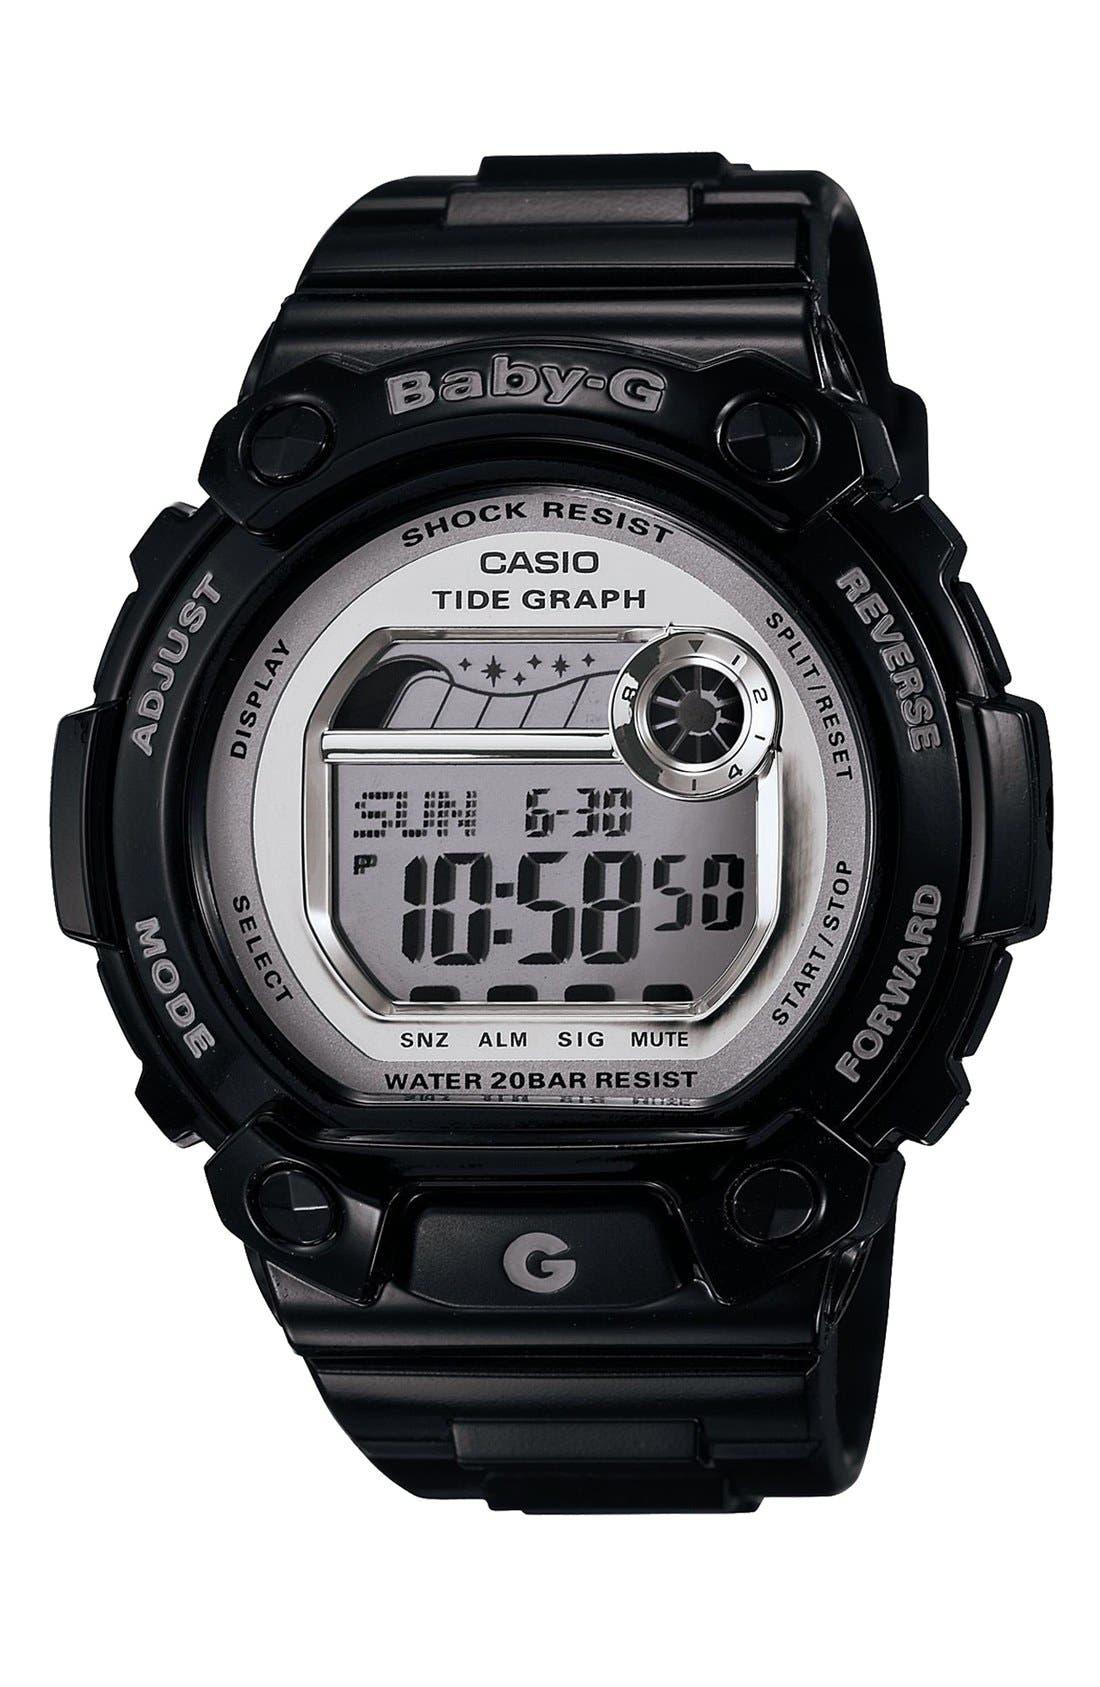 Main Image - Baby-G 'Tidegraph' Digital Watch, 45mm x 42mm